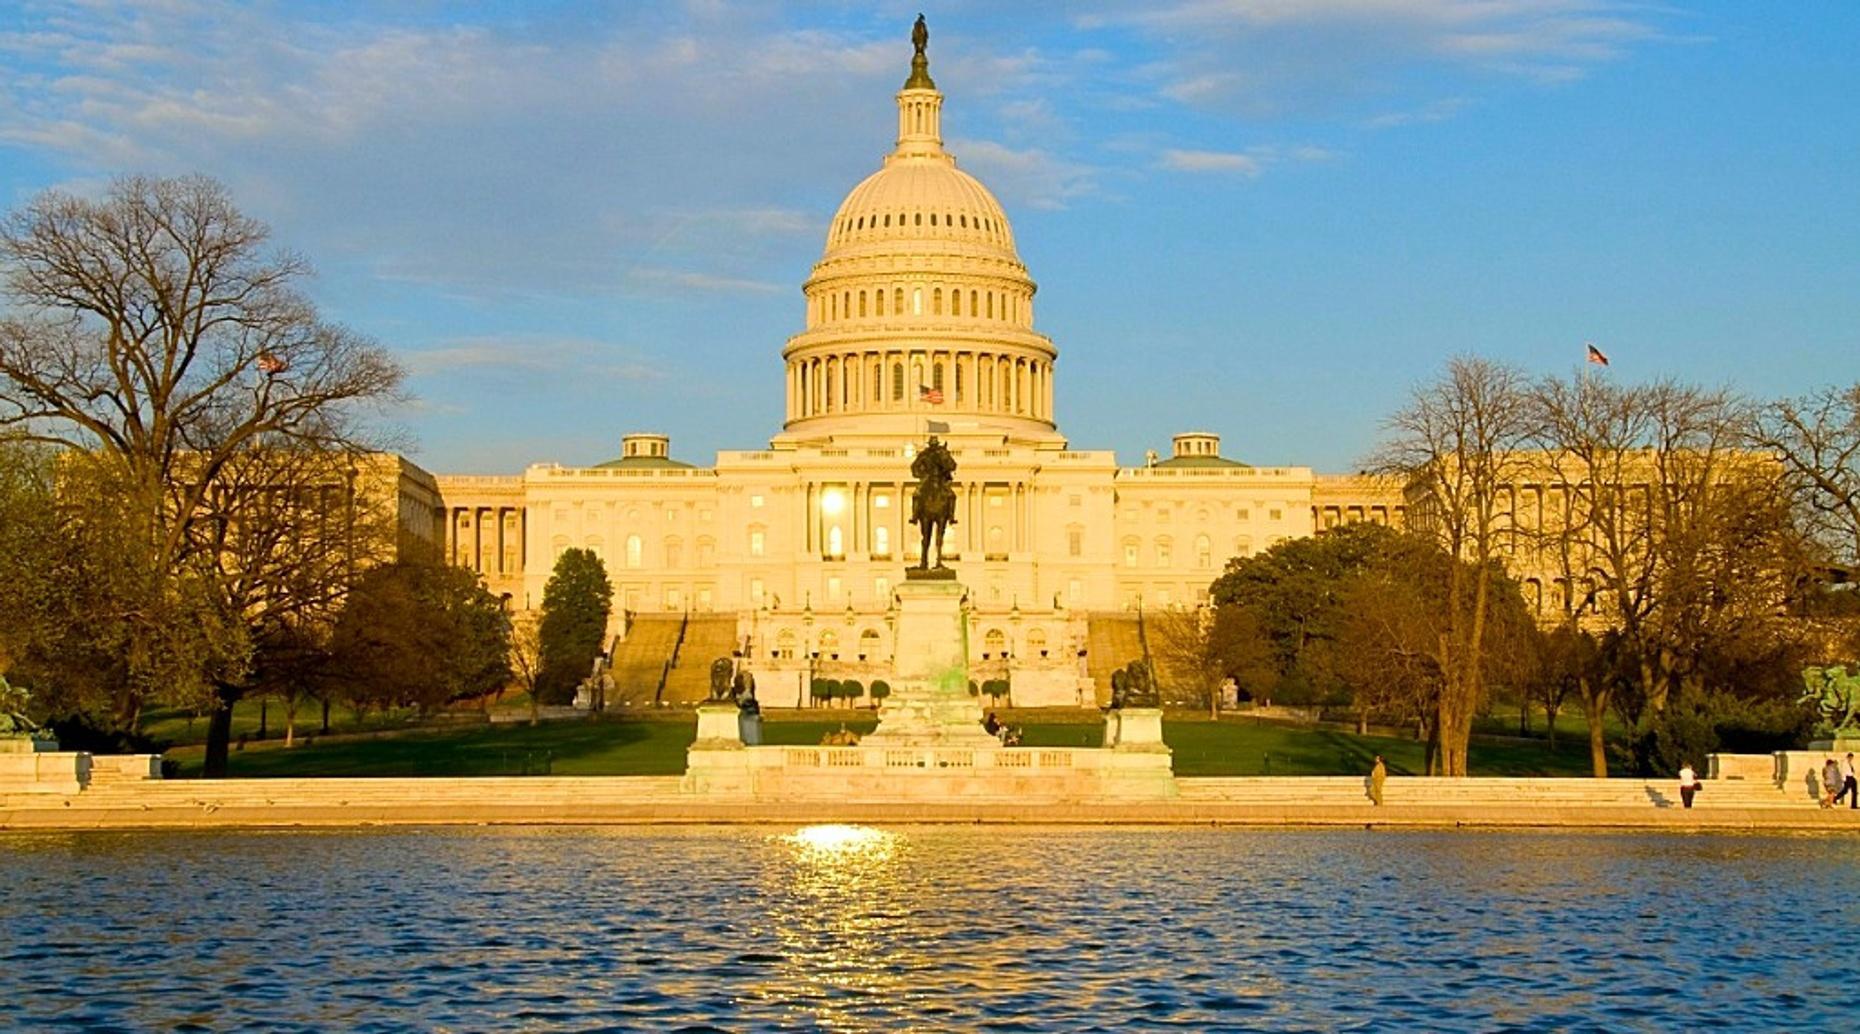 Duck Boat Tour in Washington D.C.